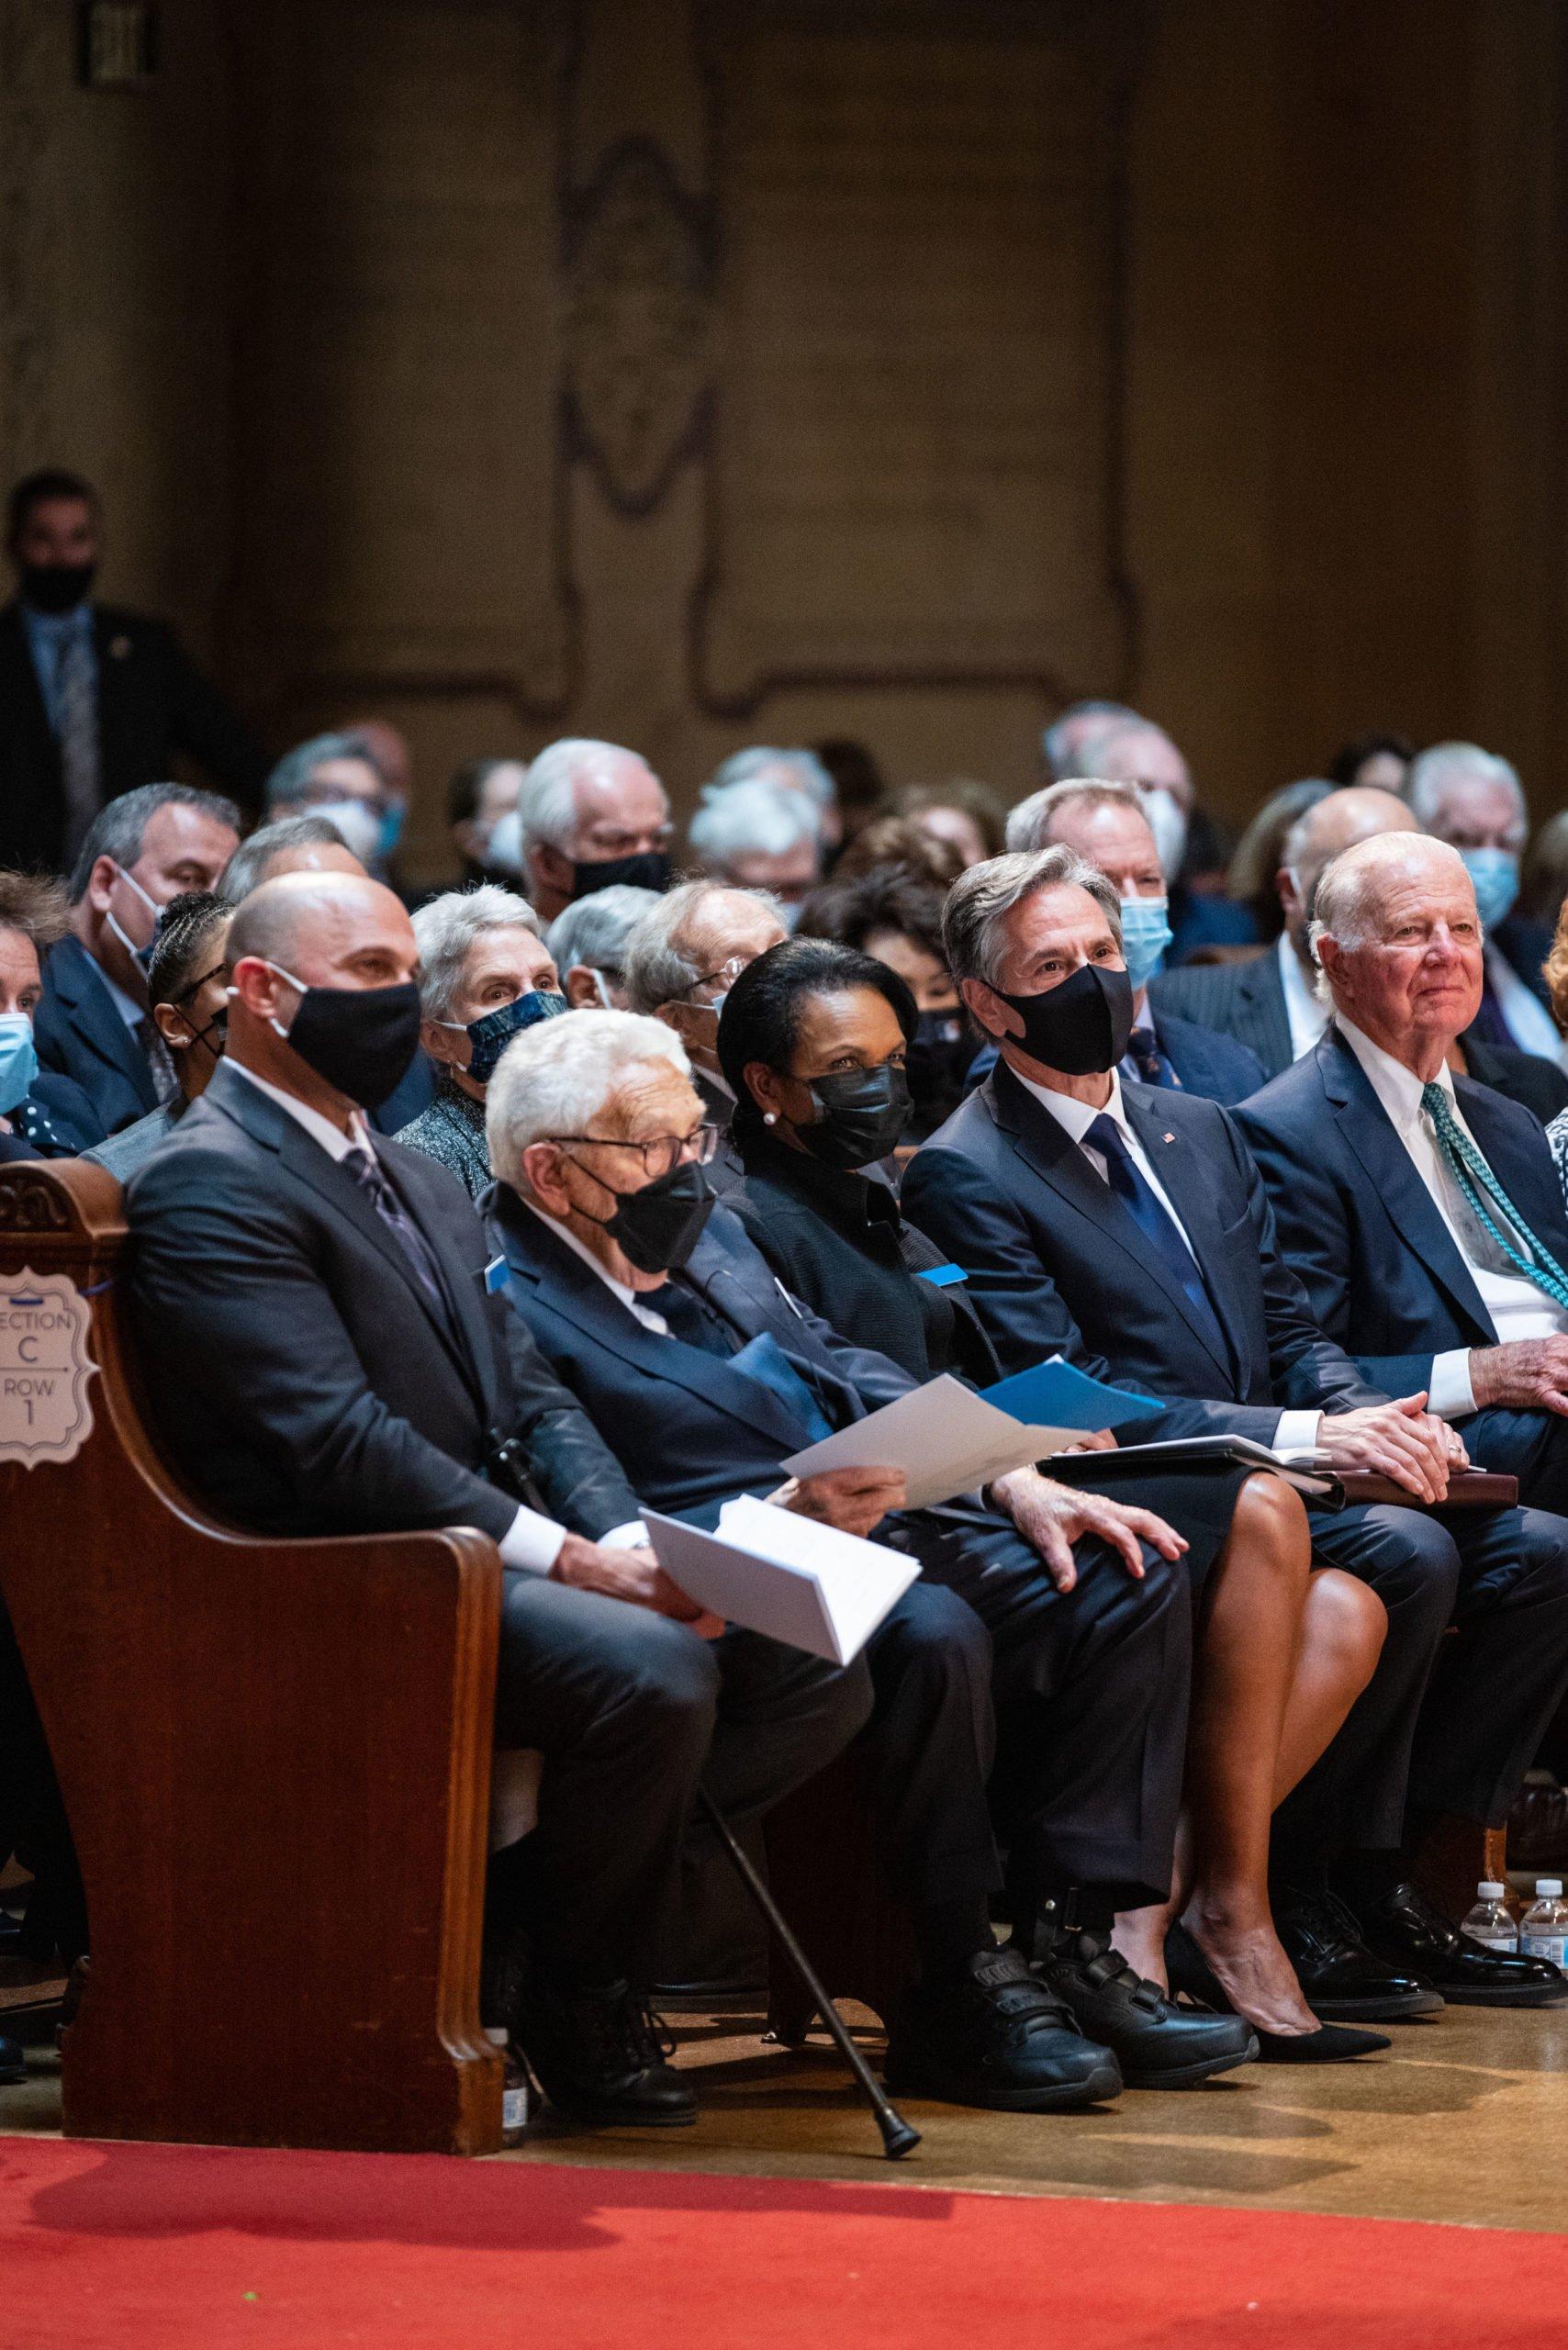 Former U.S. Secretaries of State Henry Kissinger, Condoleezza Rice, James Baker and current Secretary of State Antony Blinken attend George Shultz's memorial service at Memorial Church.